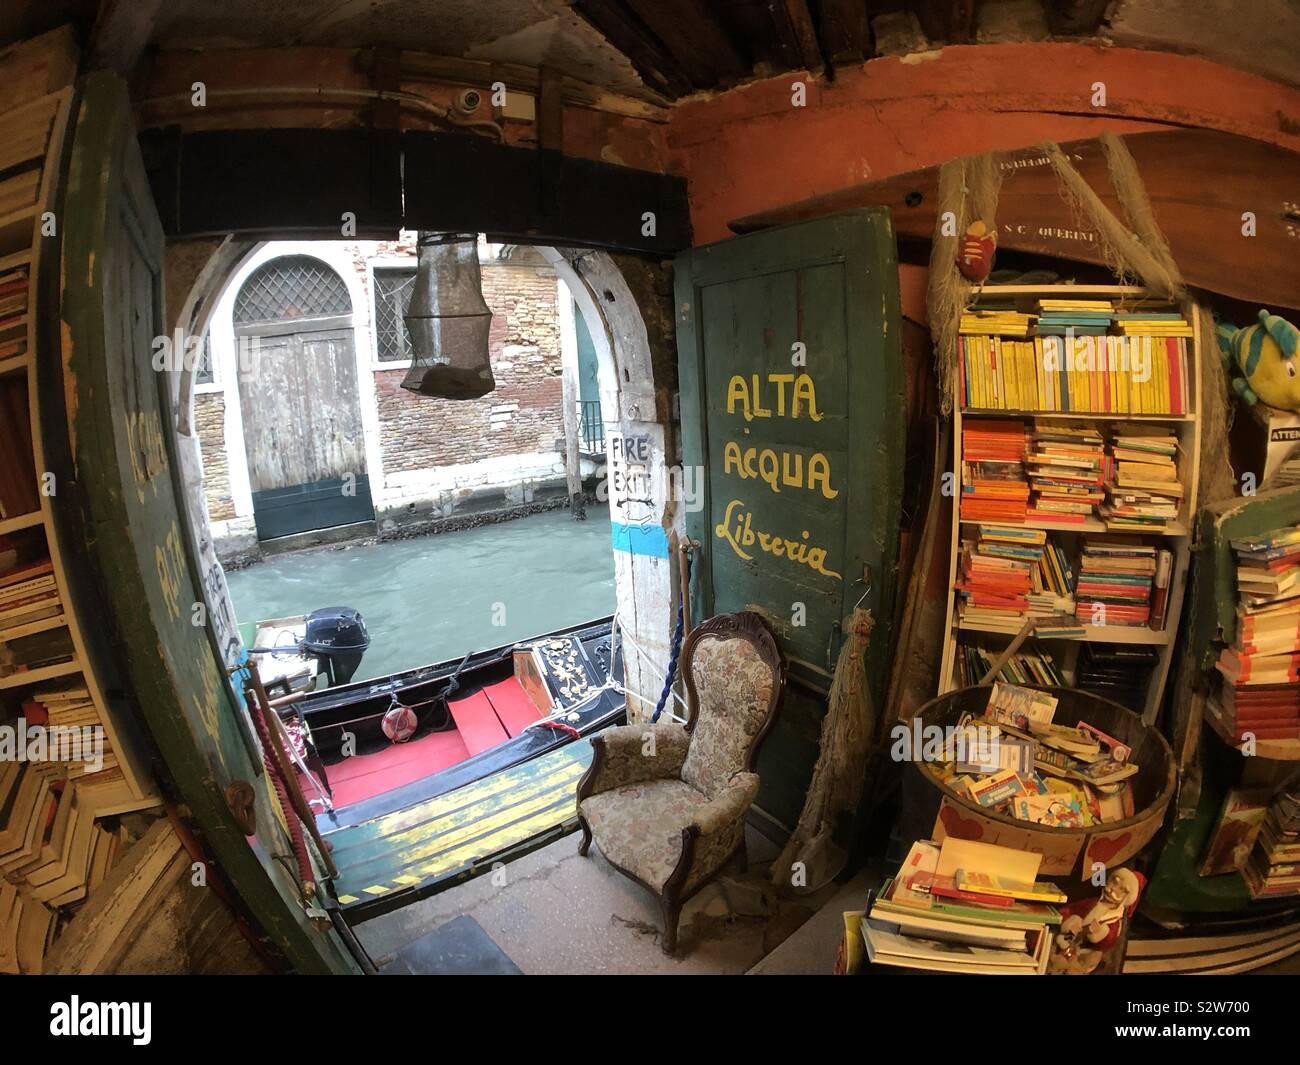 Alta Aqua bookshop, Venezia. Foto Stock